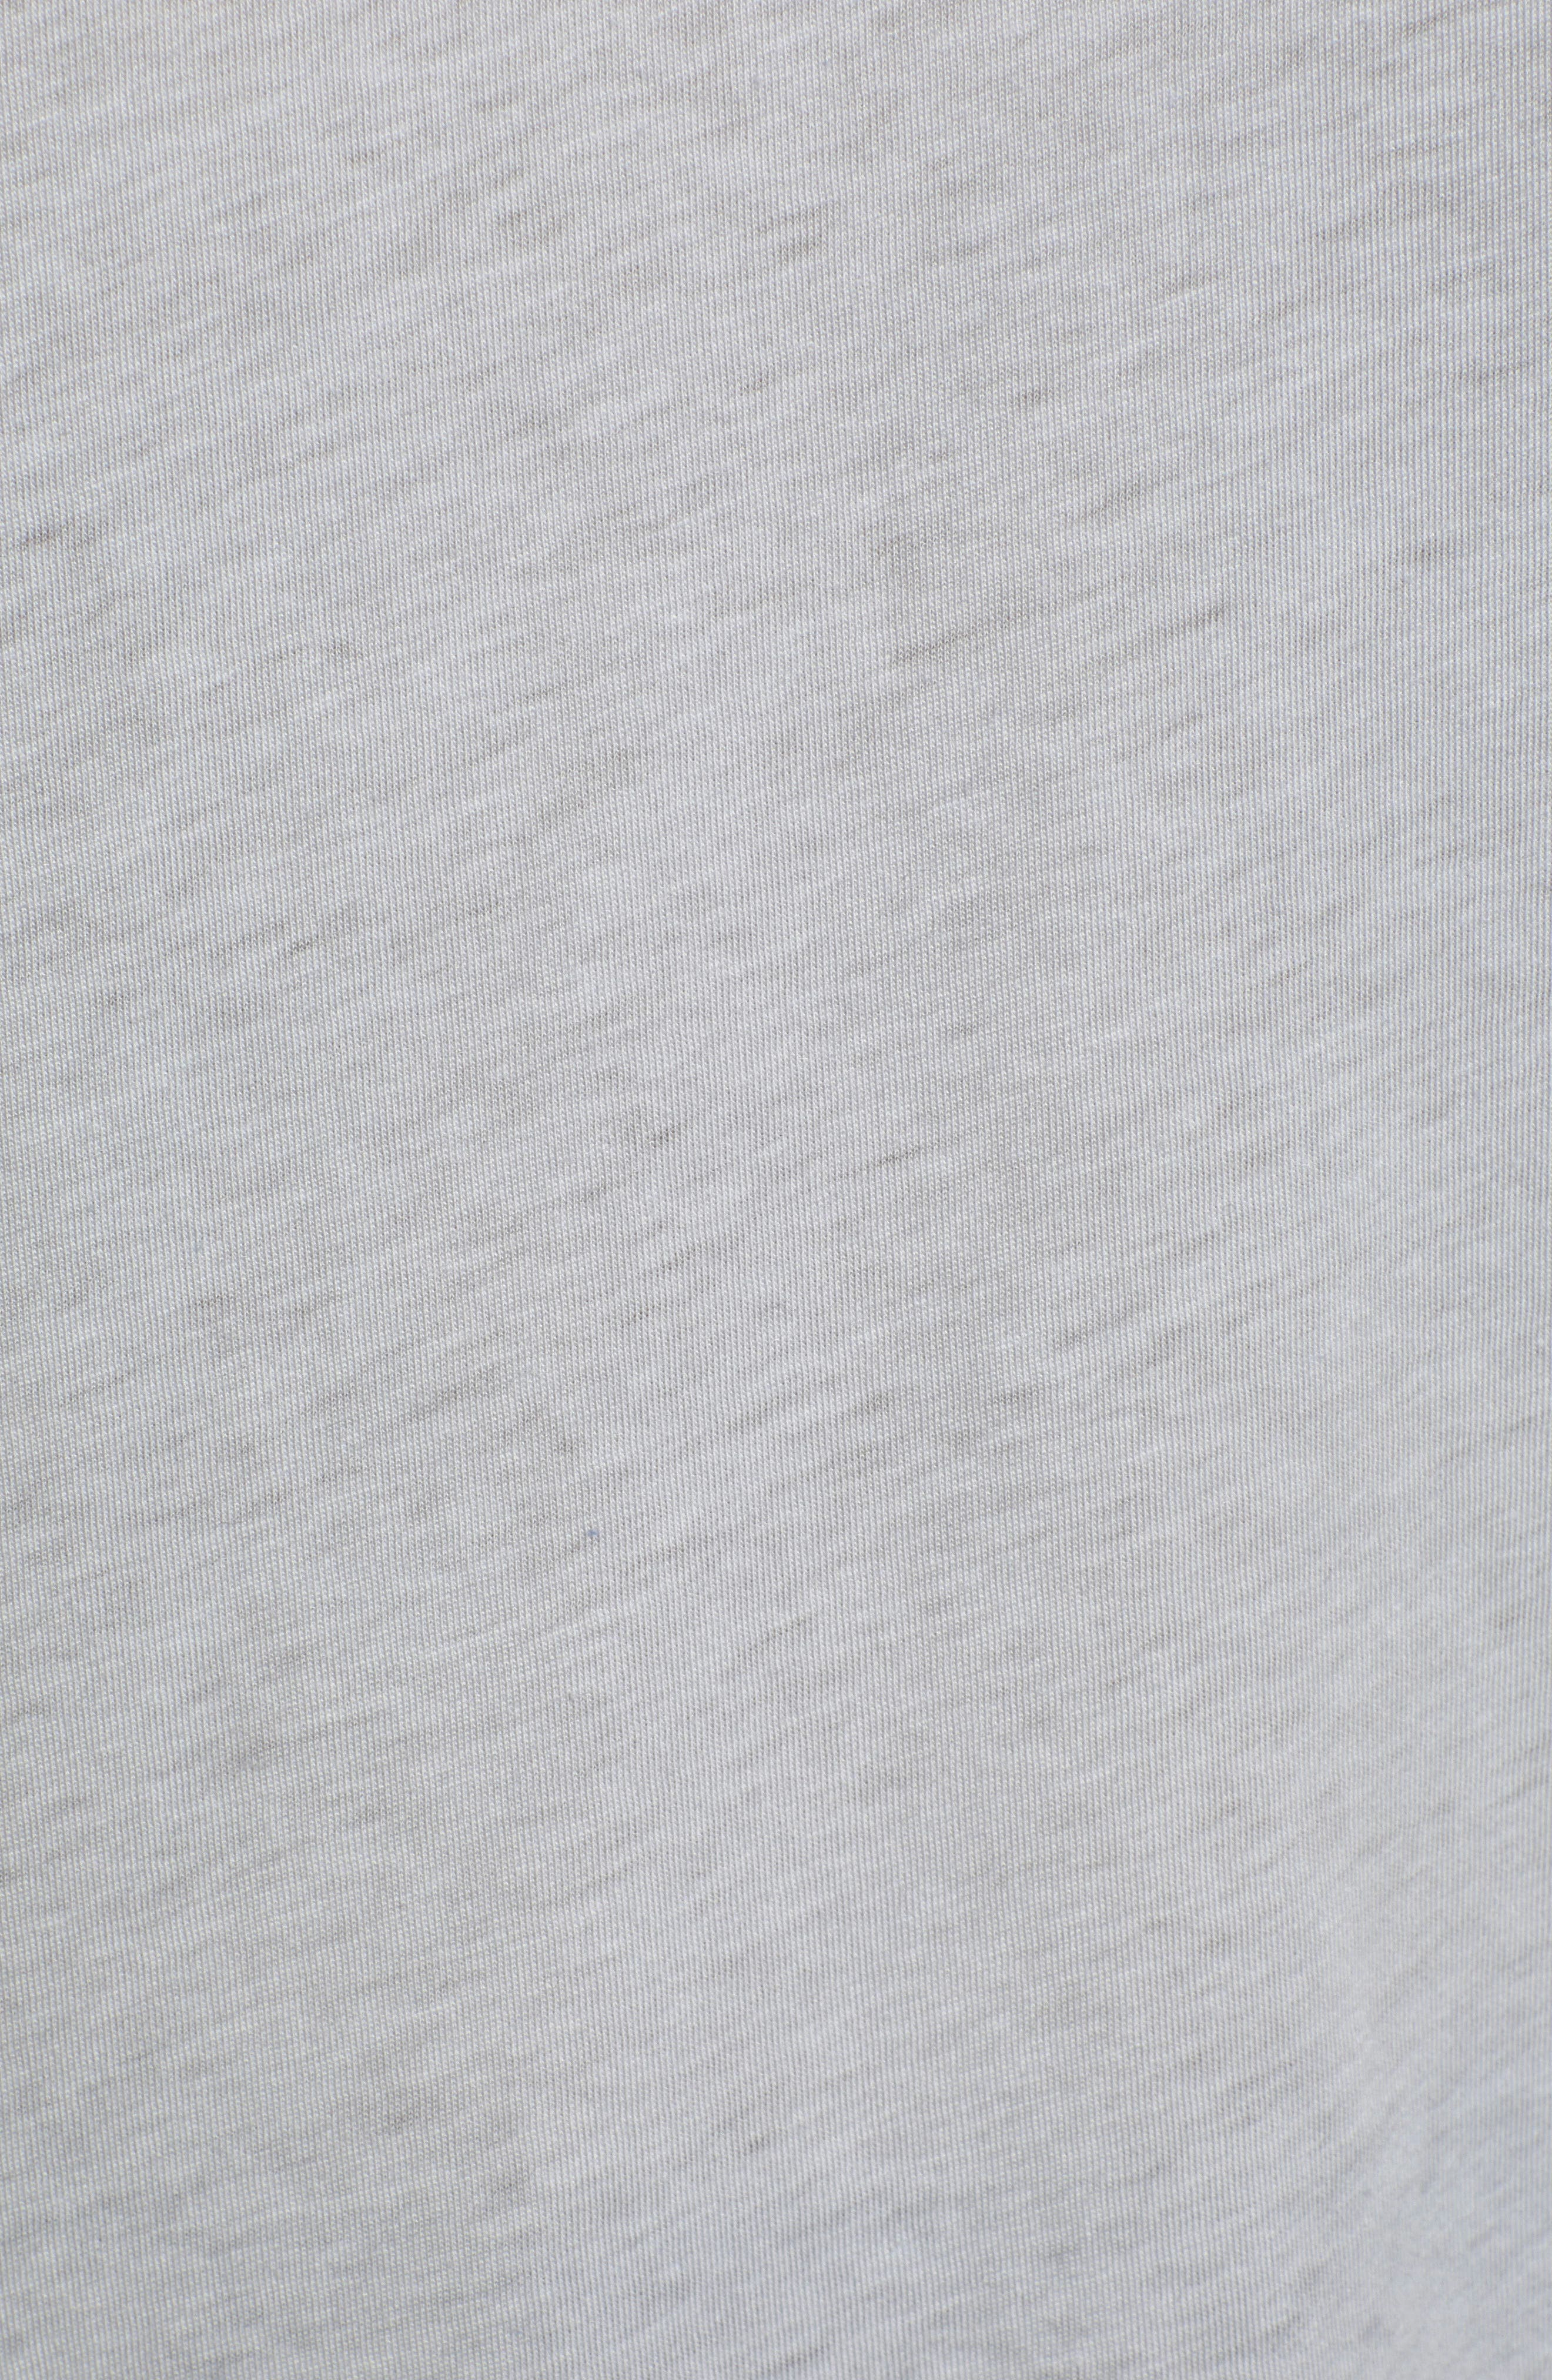 Half Sleeve Baseball Tee,                             Alternate thumbnail 5, color,                             GREY HTHR- BLUE SODALITE COMBO